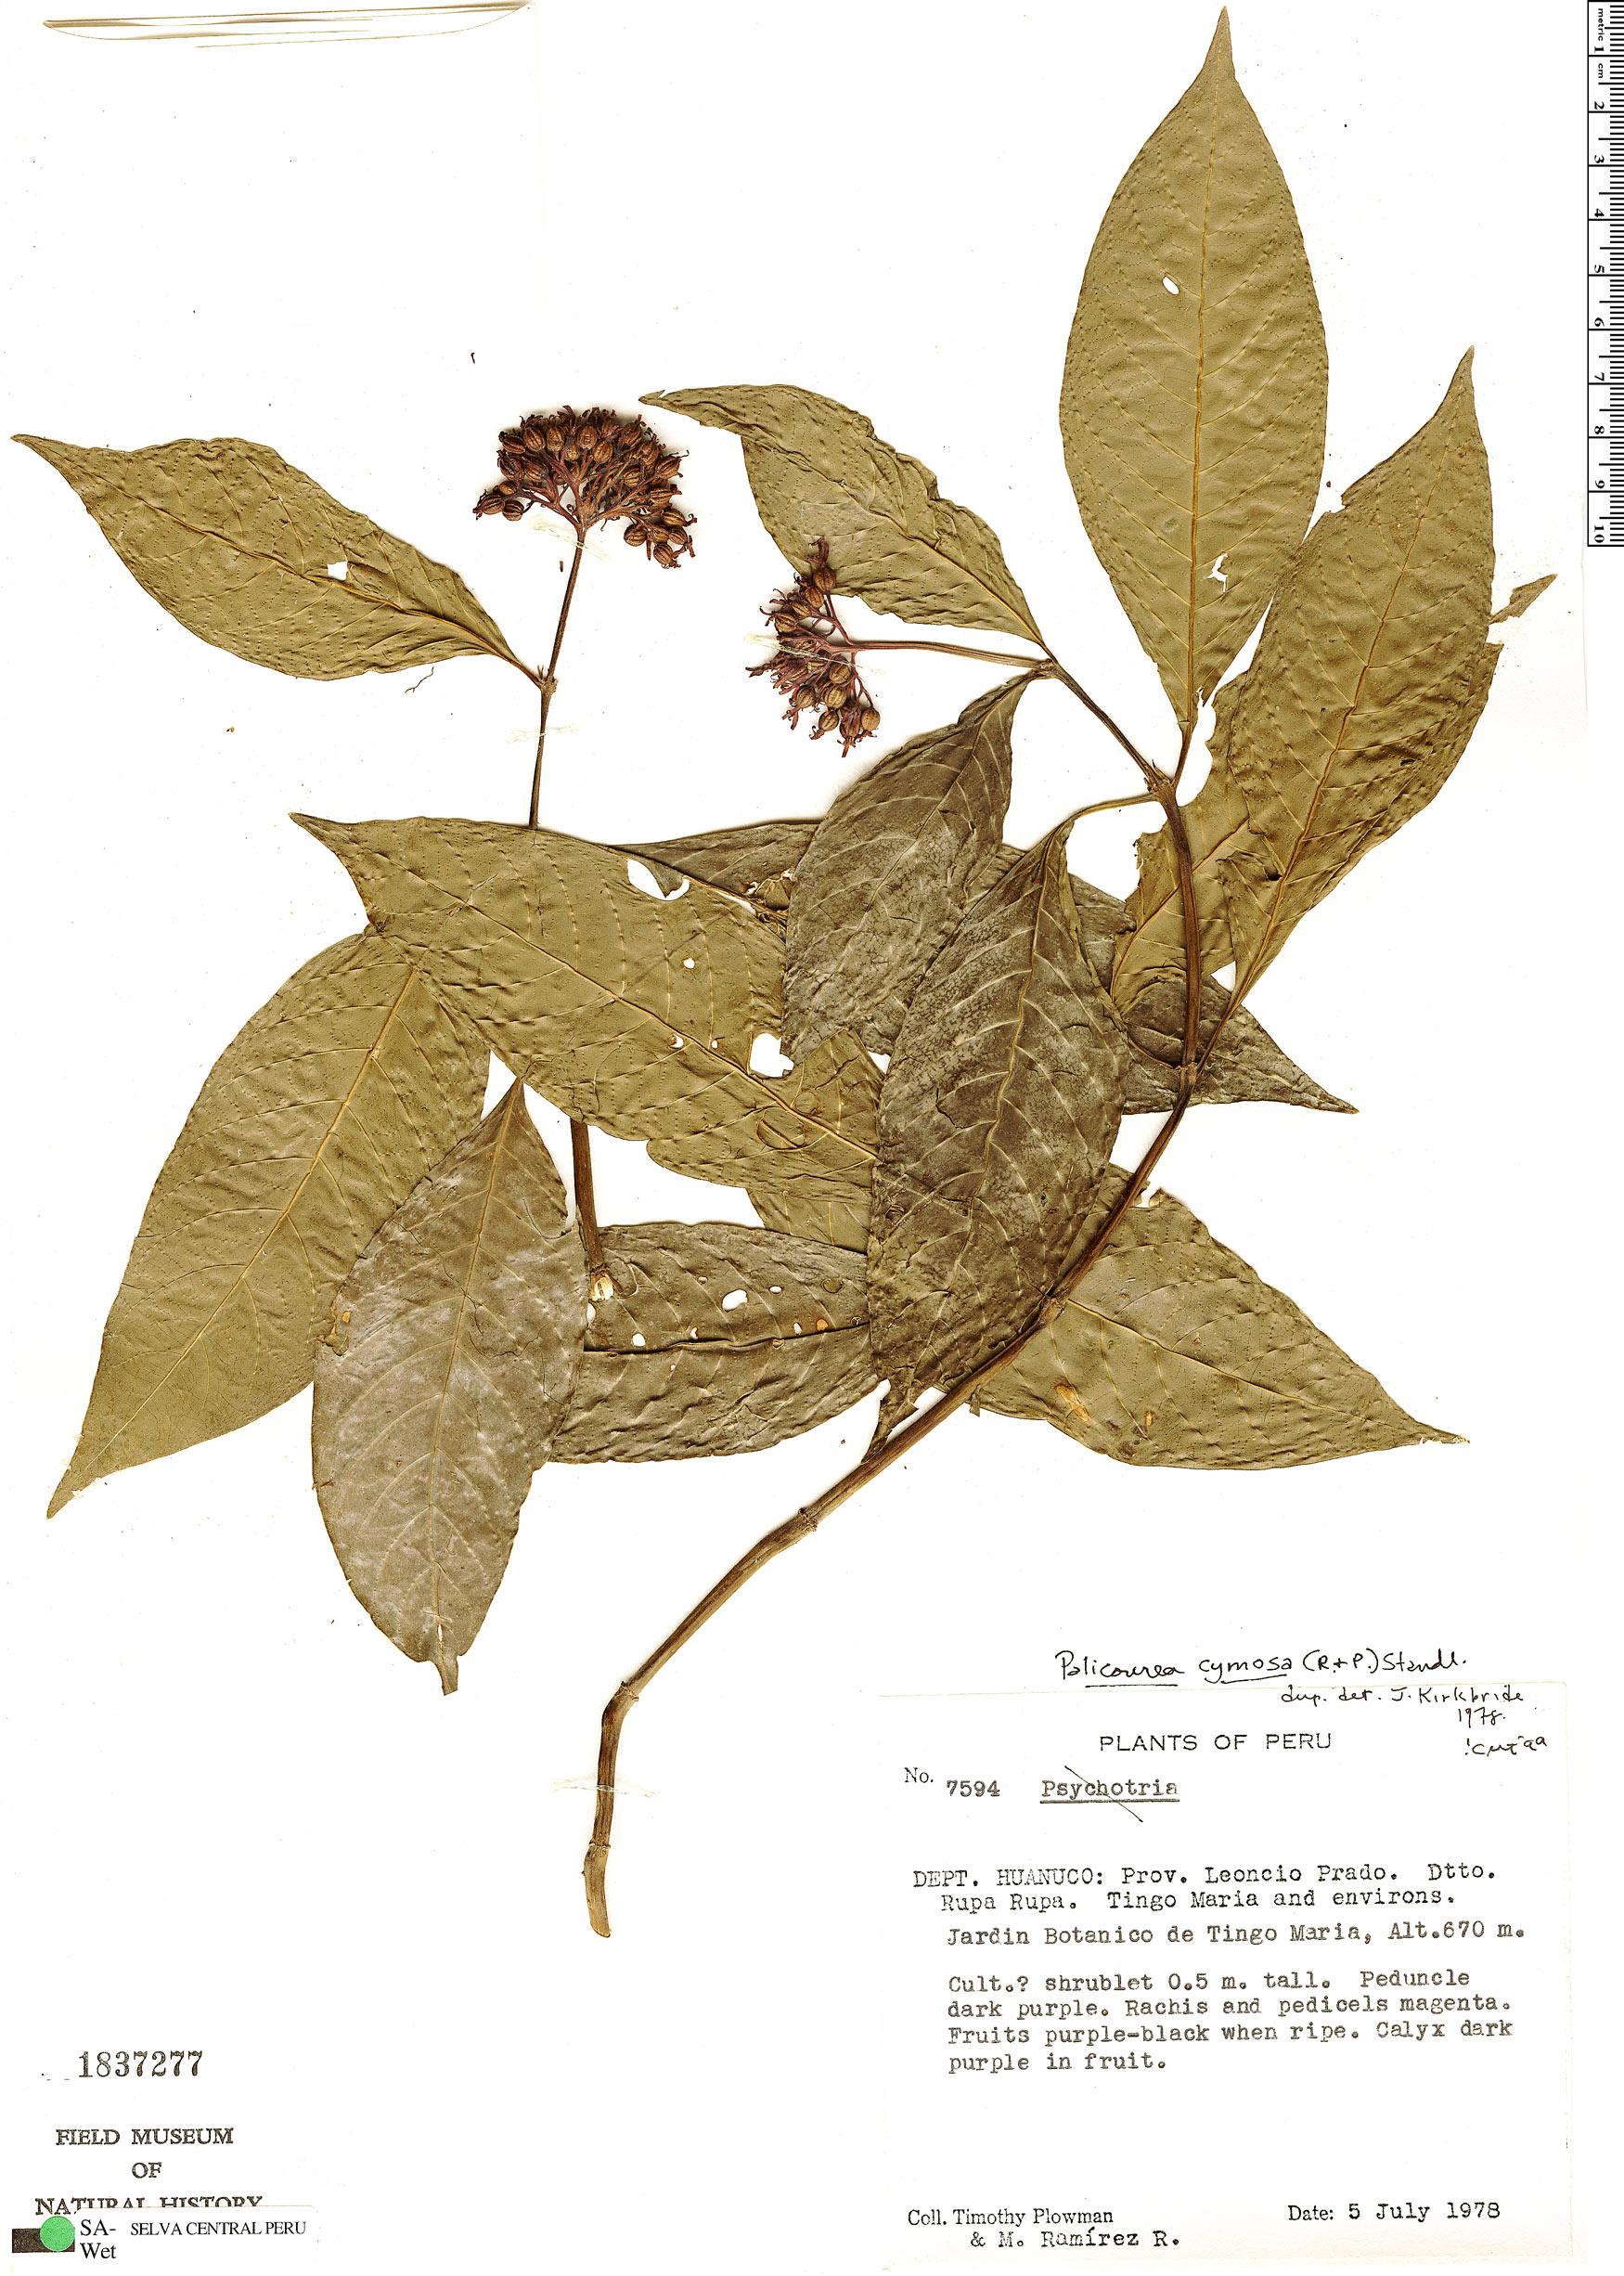 Specimen: Palicourea cymosa